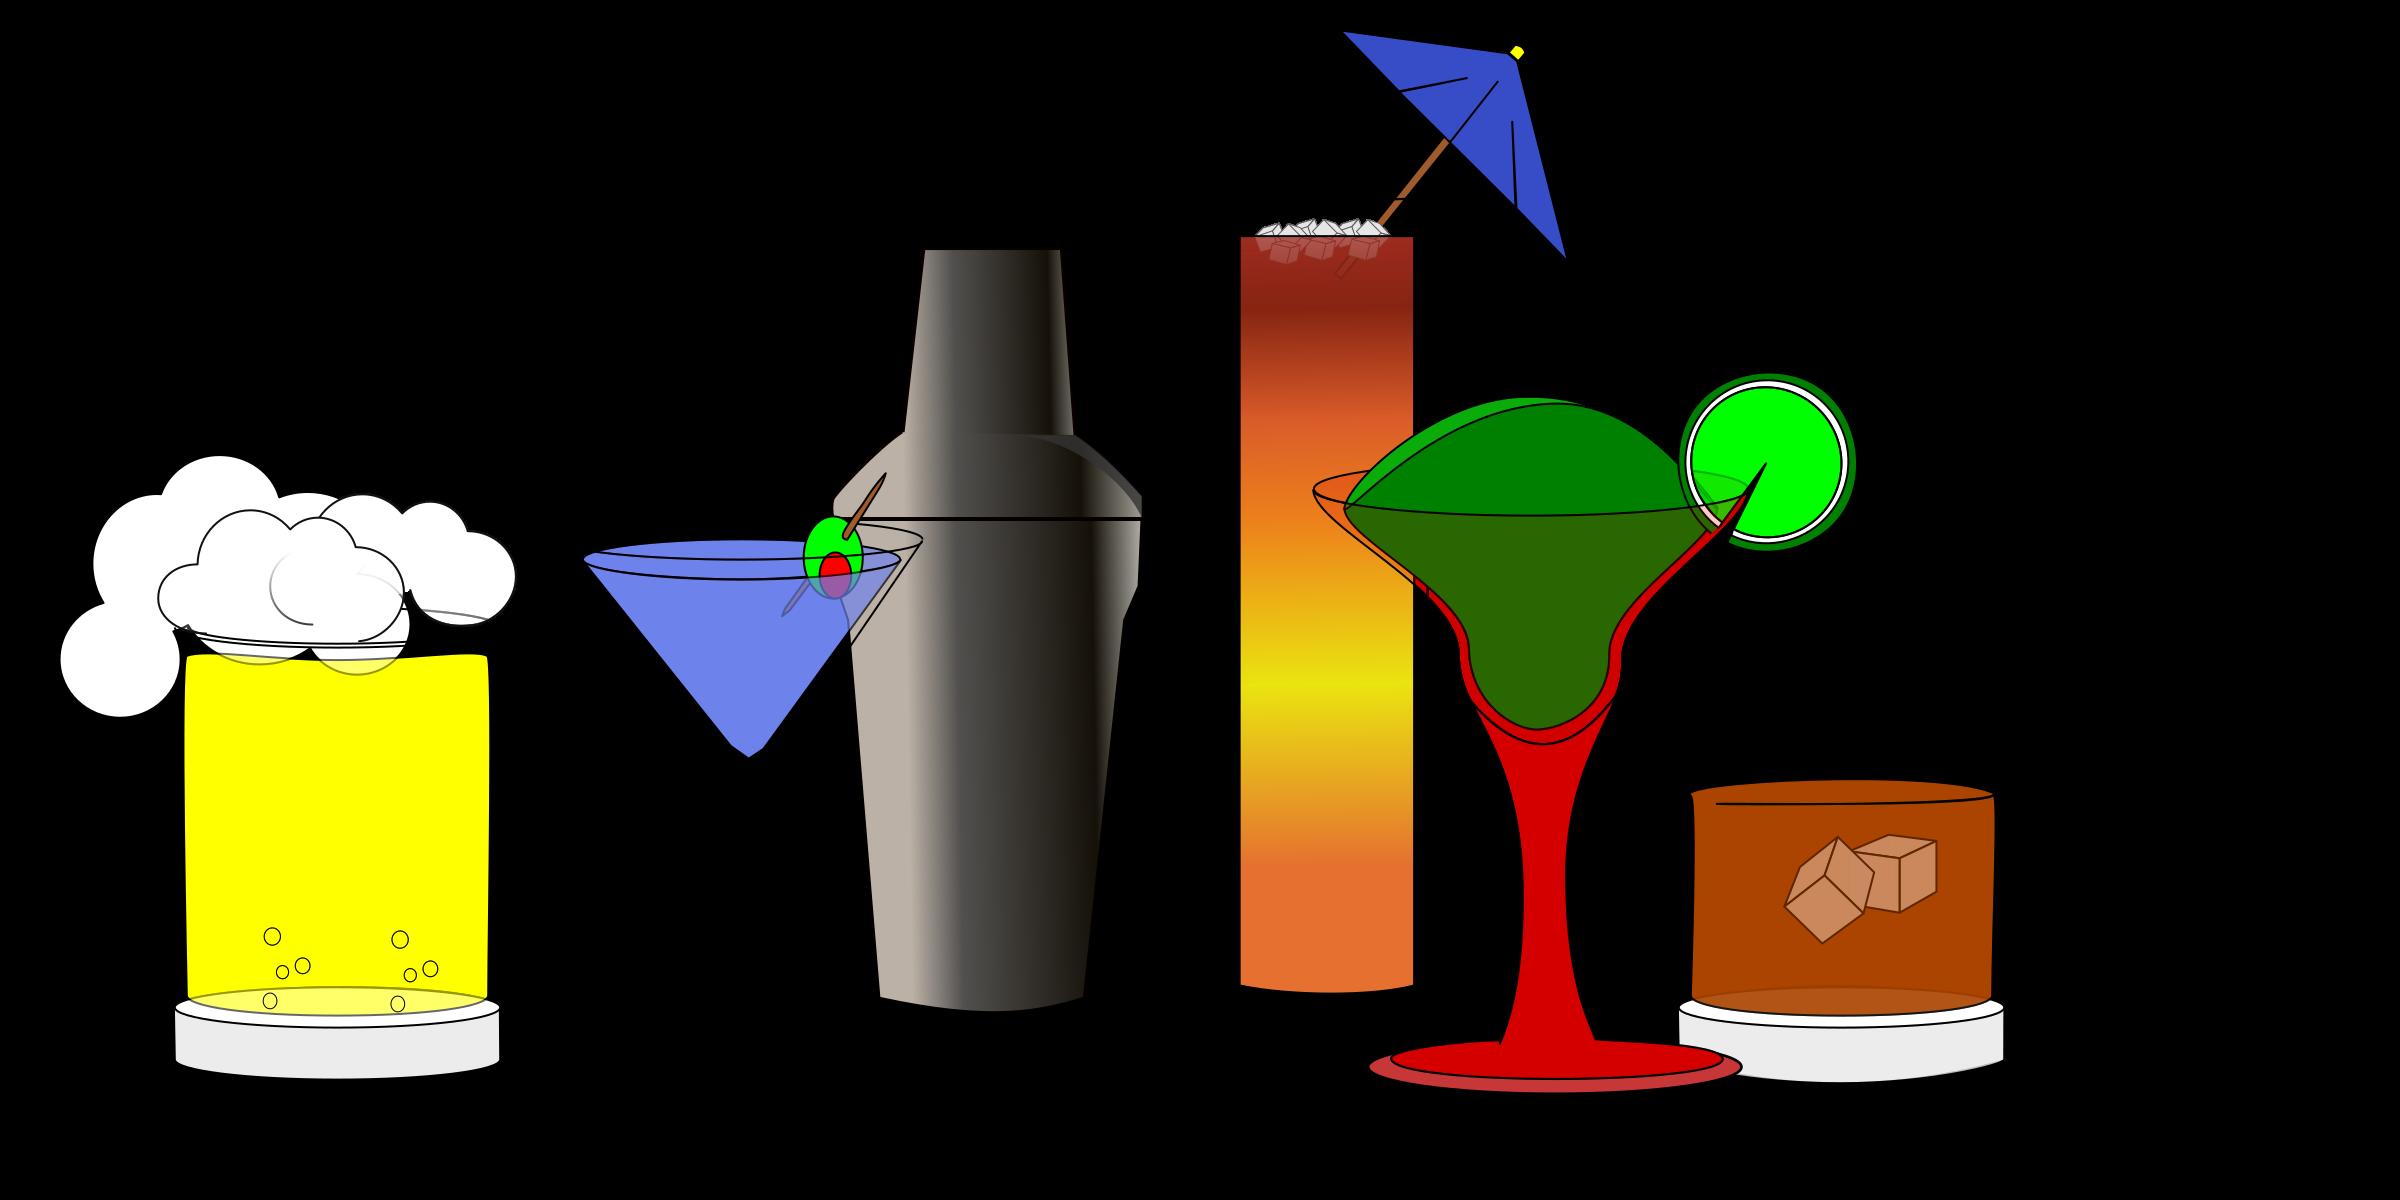 Happy drink animations big. Conversation clipart social hour